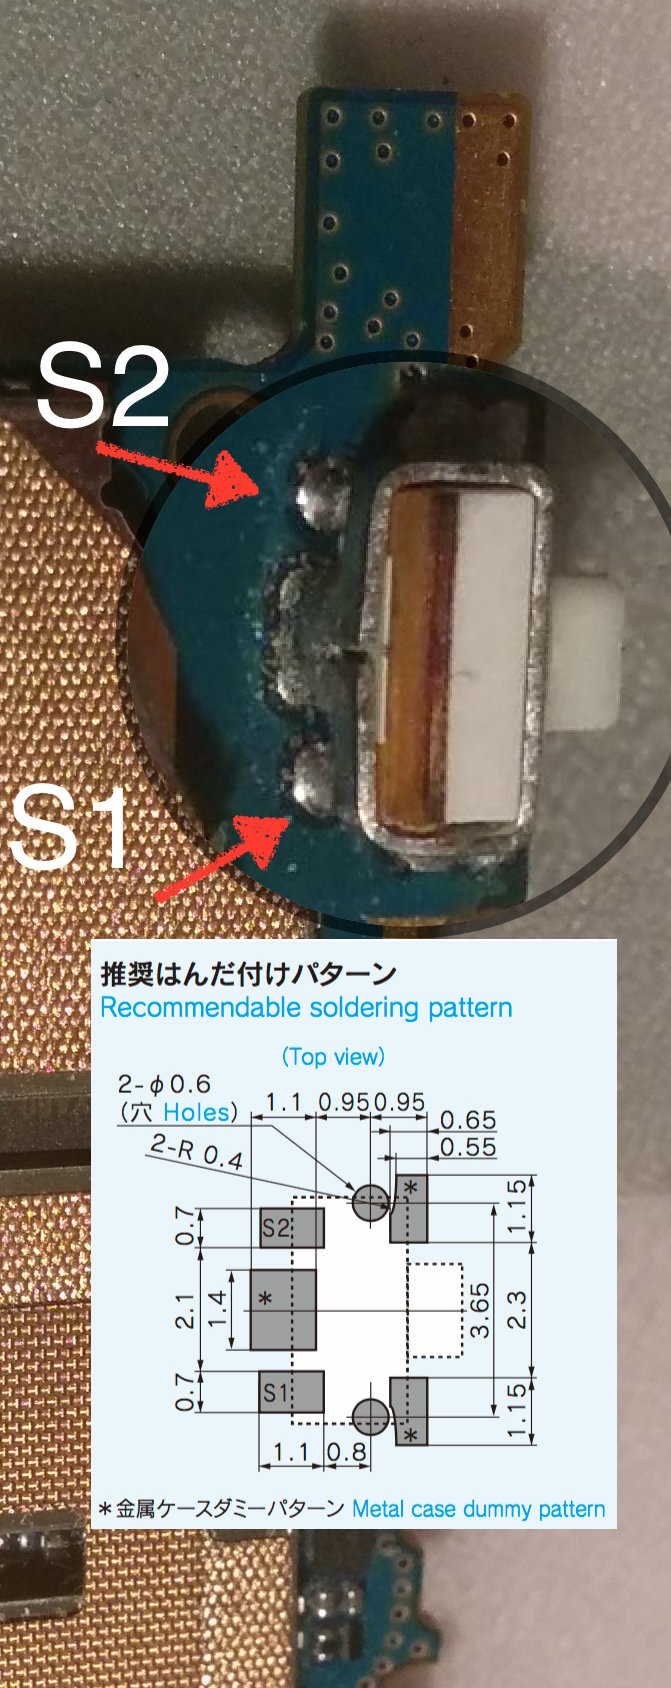 Nexus 5 Circuit Diagram - Fuse Box On 2005 Infiniti G35 for Wiring Diagram  SchematicsWiring Diagram Schematics